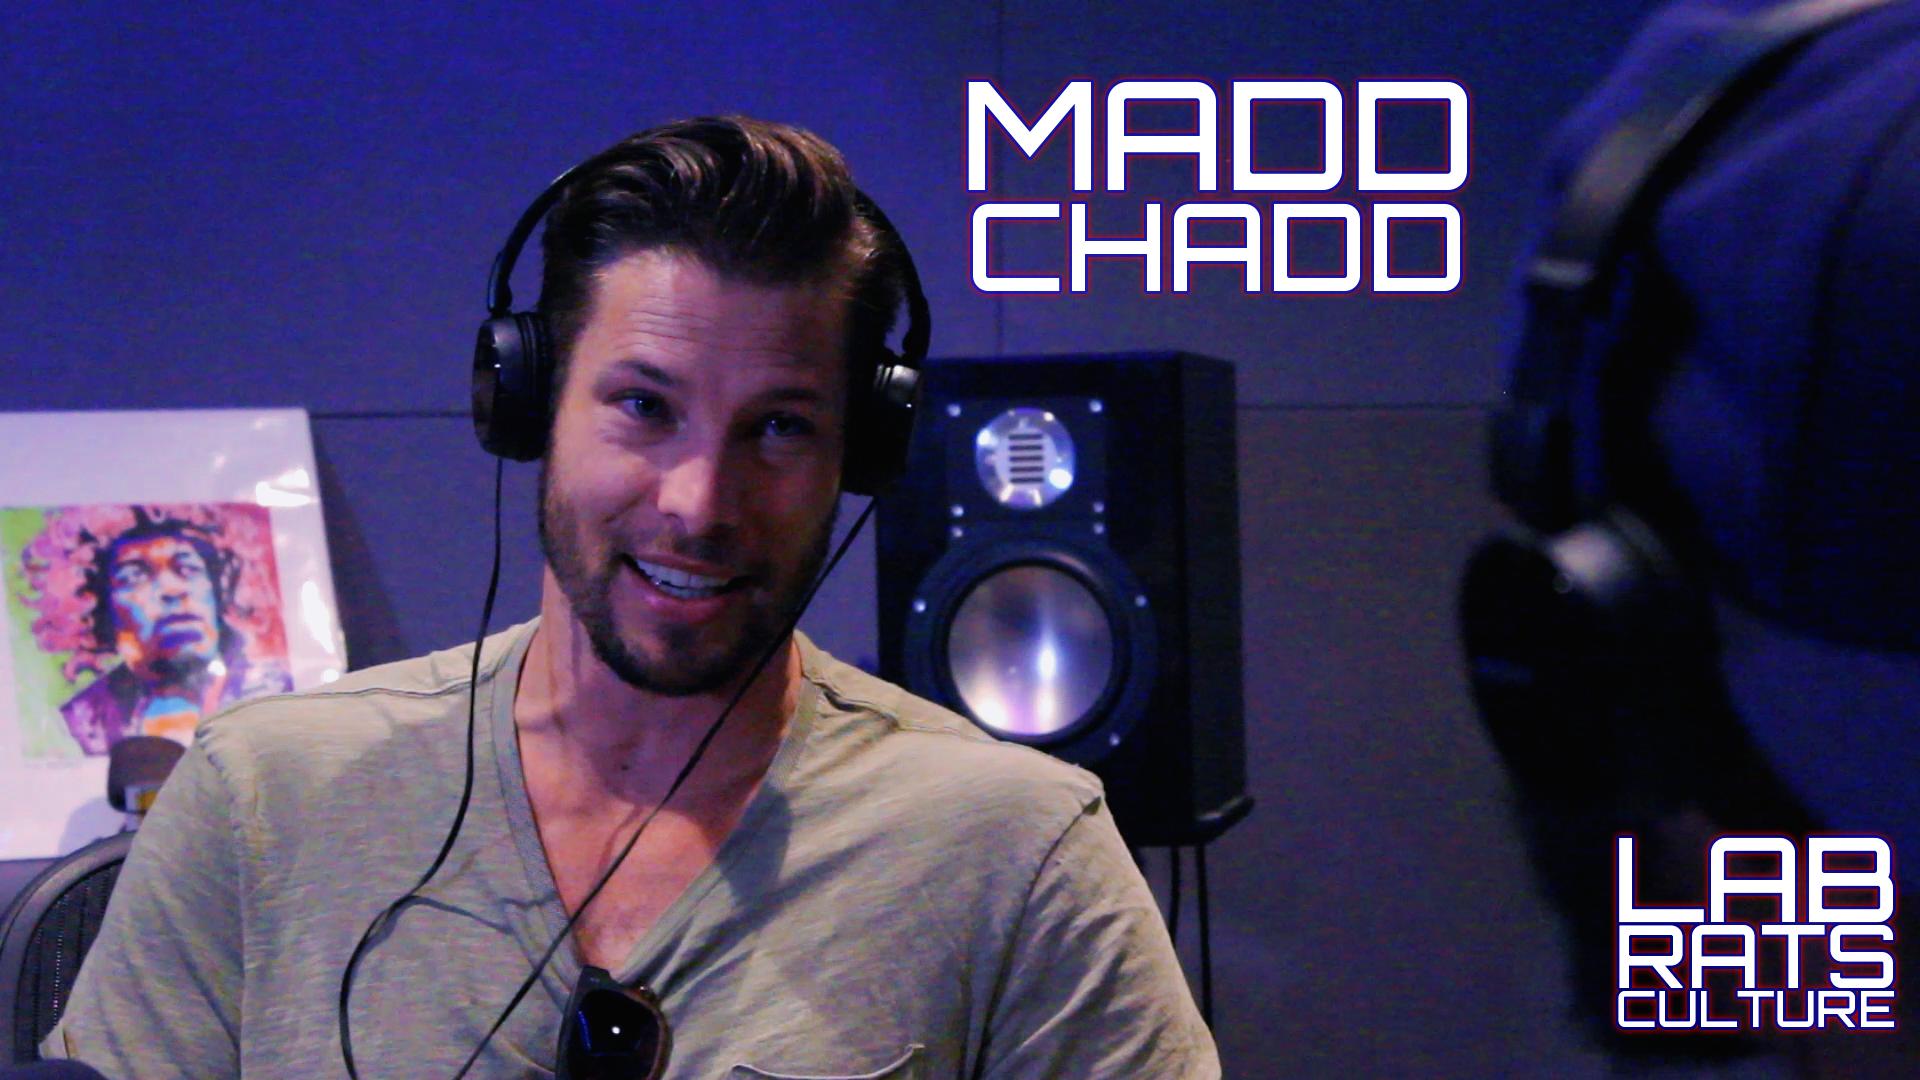 Lab Rats Culture Ep. 05 - Madd Chadd